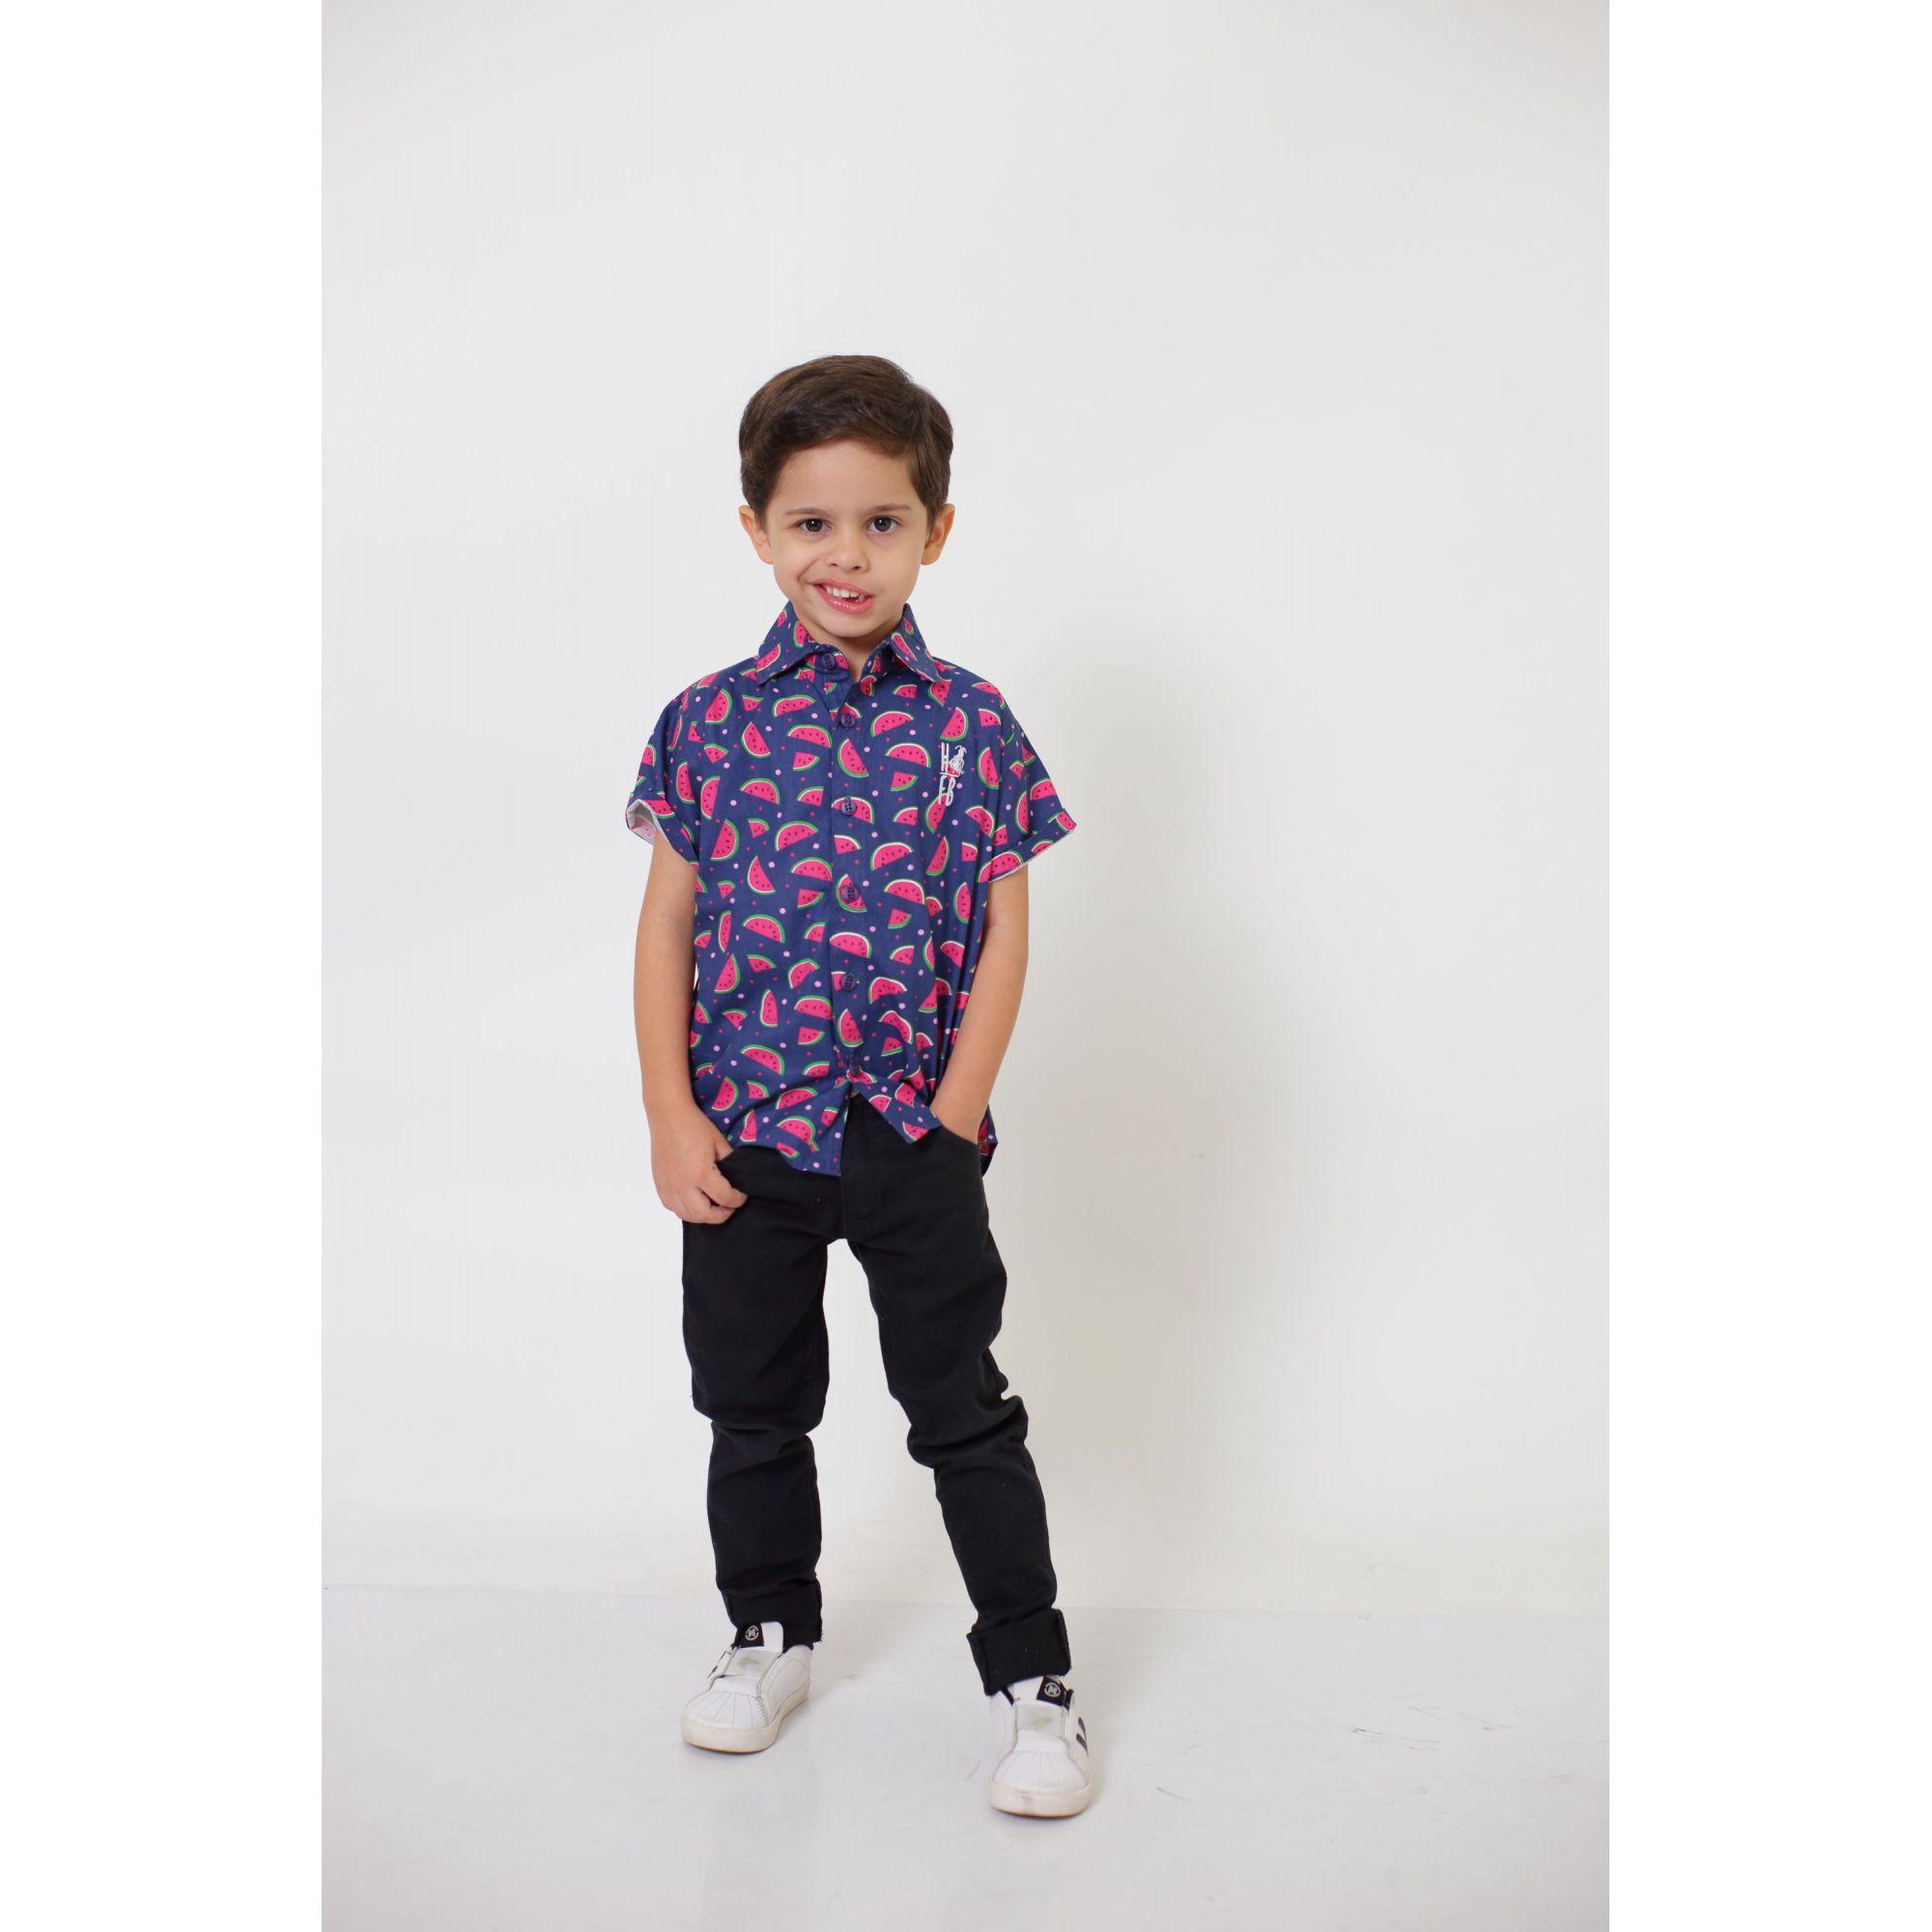 Camisa Social Manga Curta Melancia Infantil  - Heitor Fashion Brazil